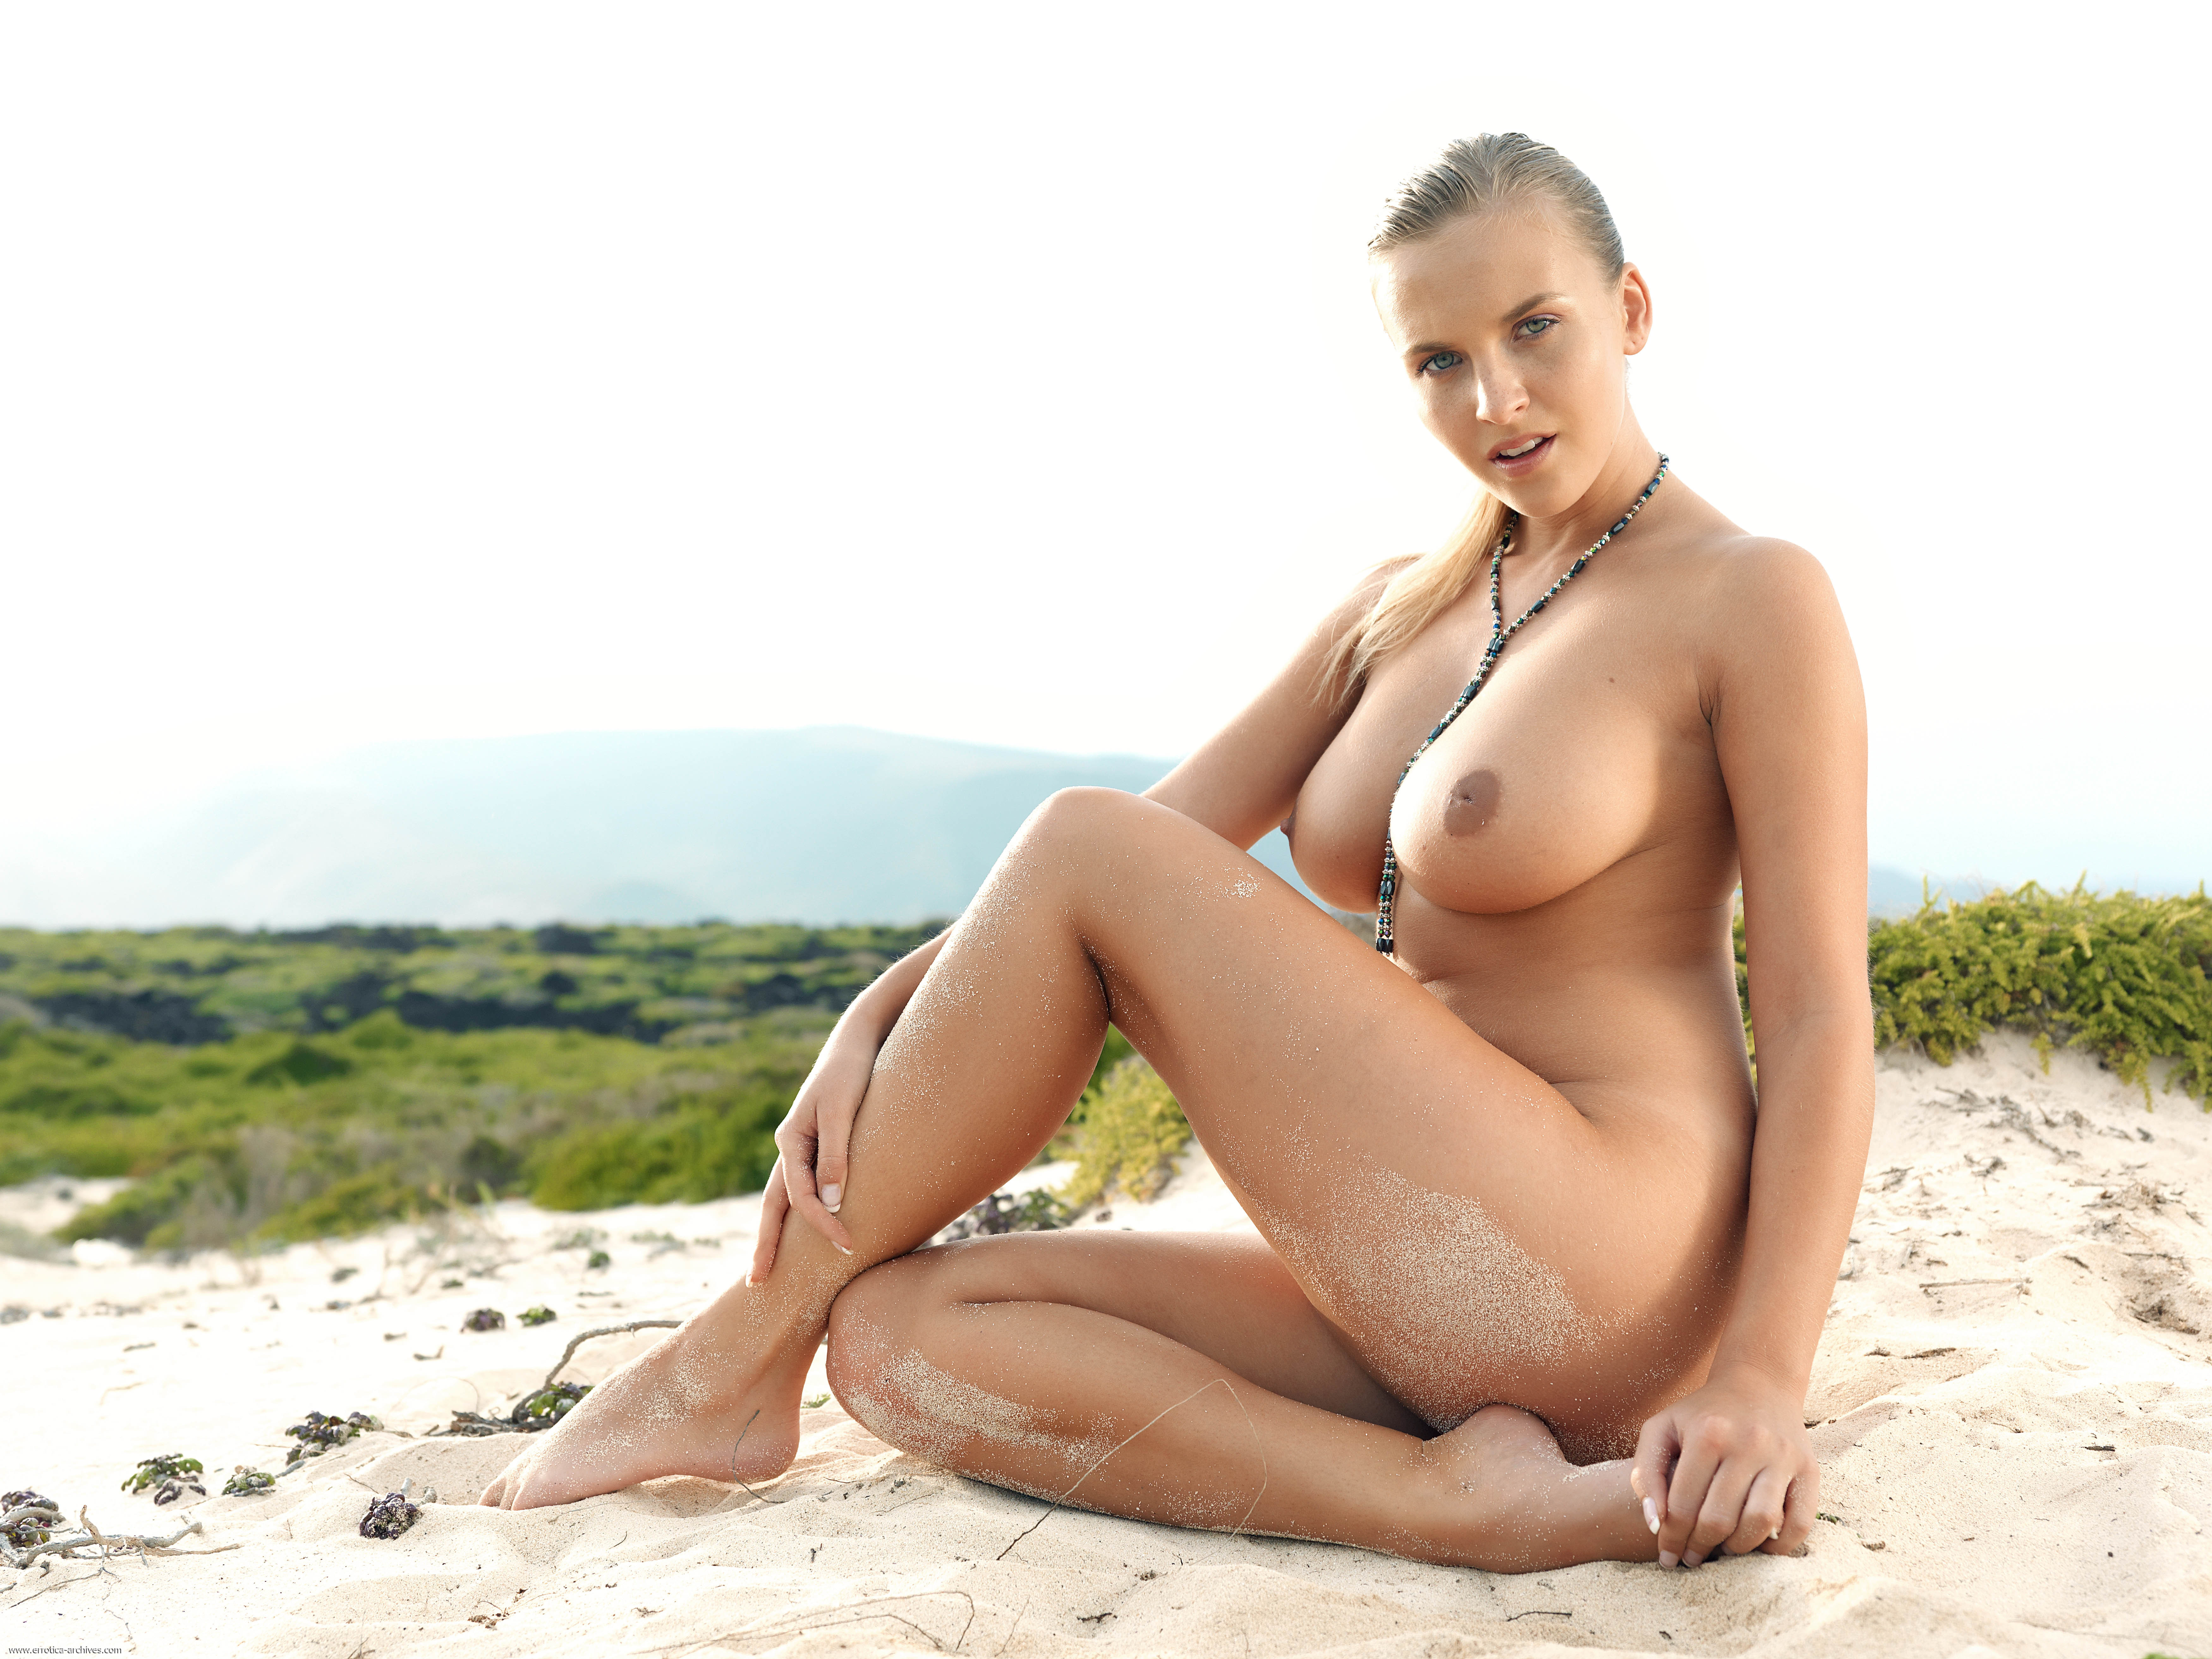 playboy fighter chicks naked